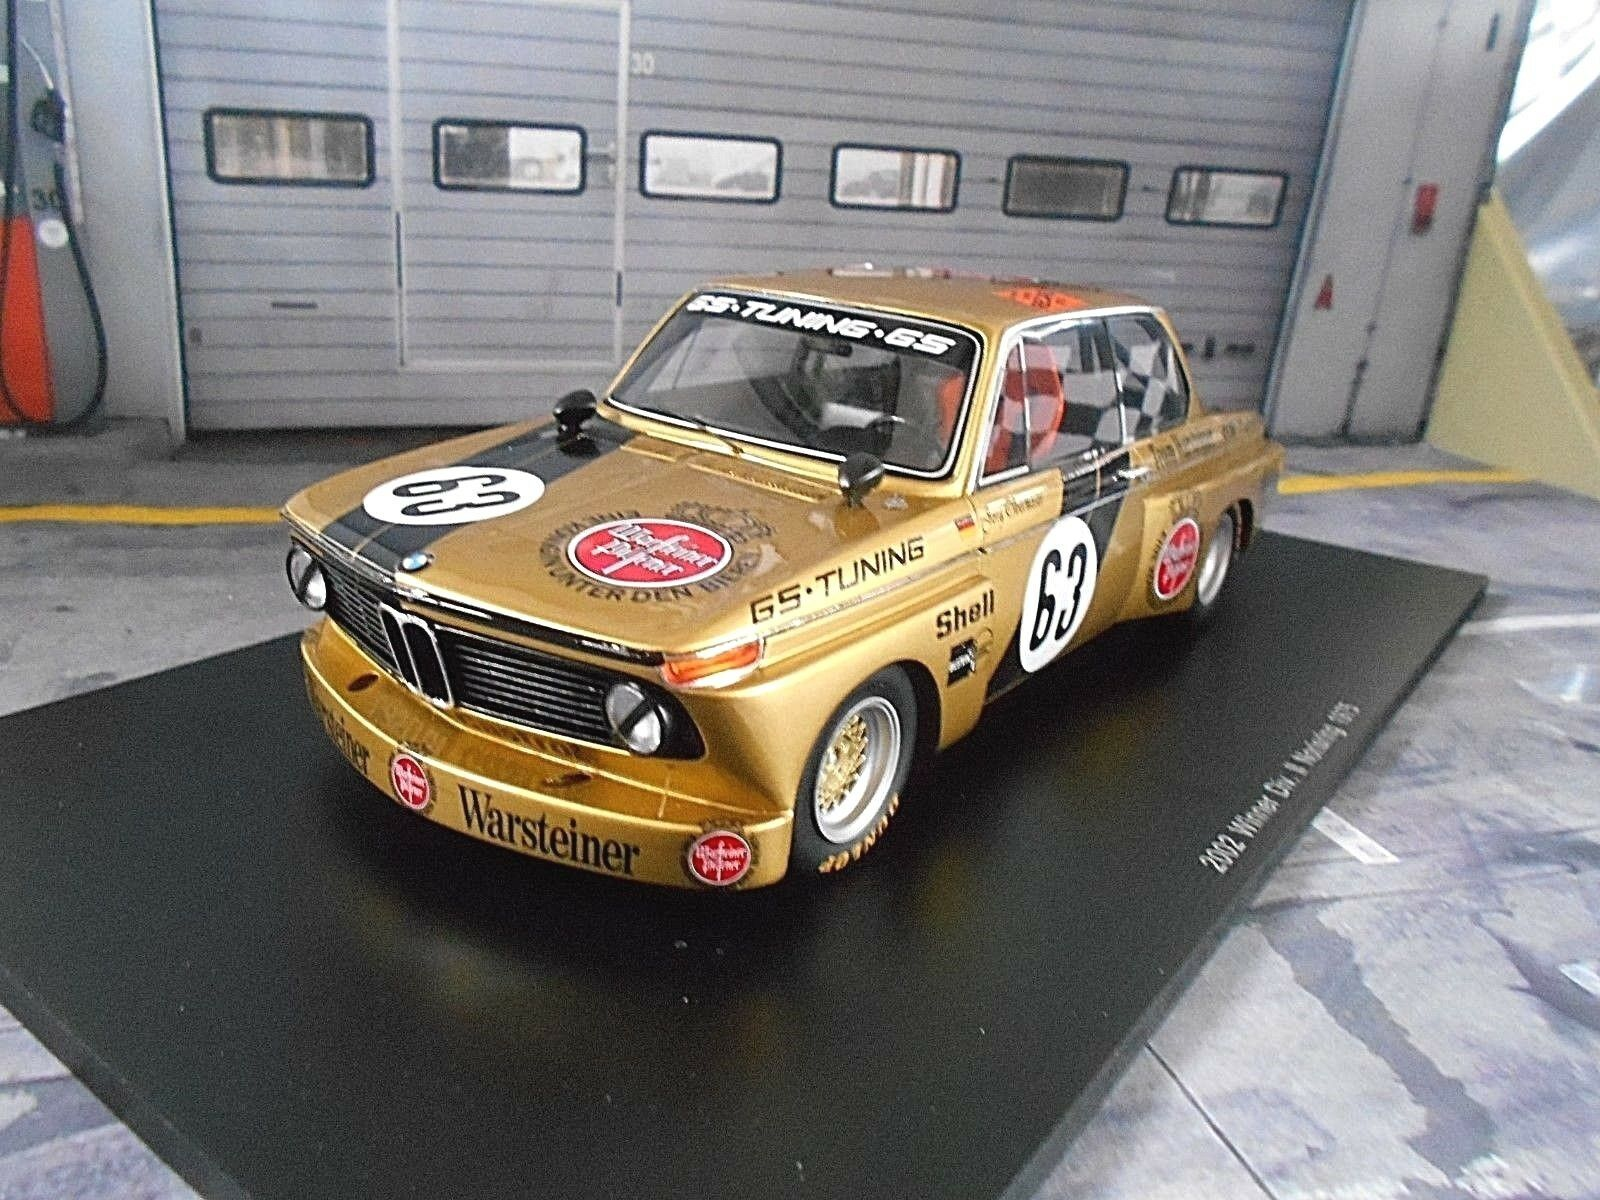 BMW 2002 Racing DRM Warsteiner GS Team Upper Moser Norisring 1975 Spark 1 18